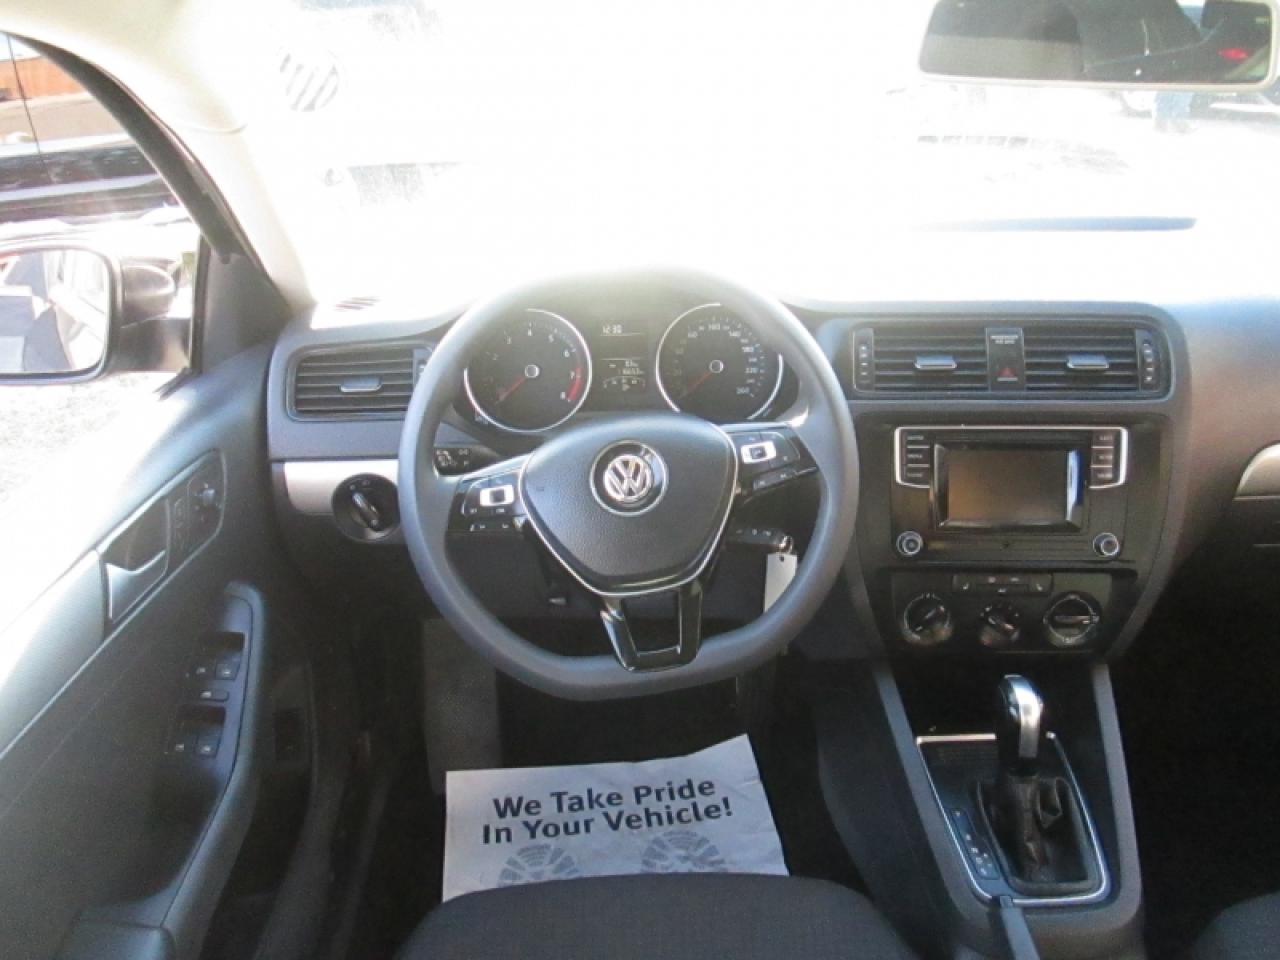 2016 Volkswagen Jetta 1.4 TSI   BIG SCREEN   REAR CAM   BLUETOOTH   HEATED SEATS